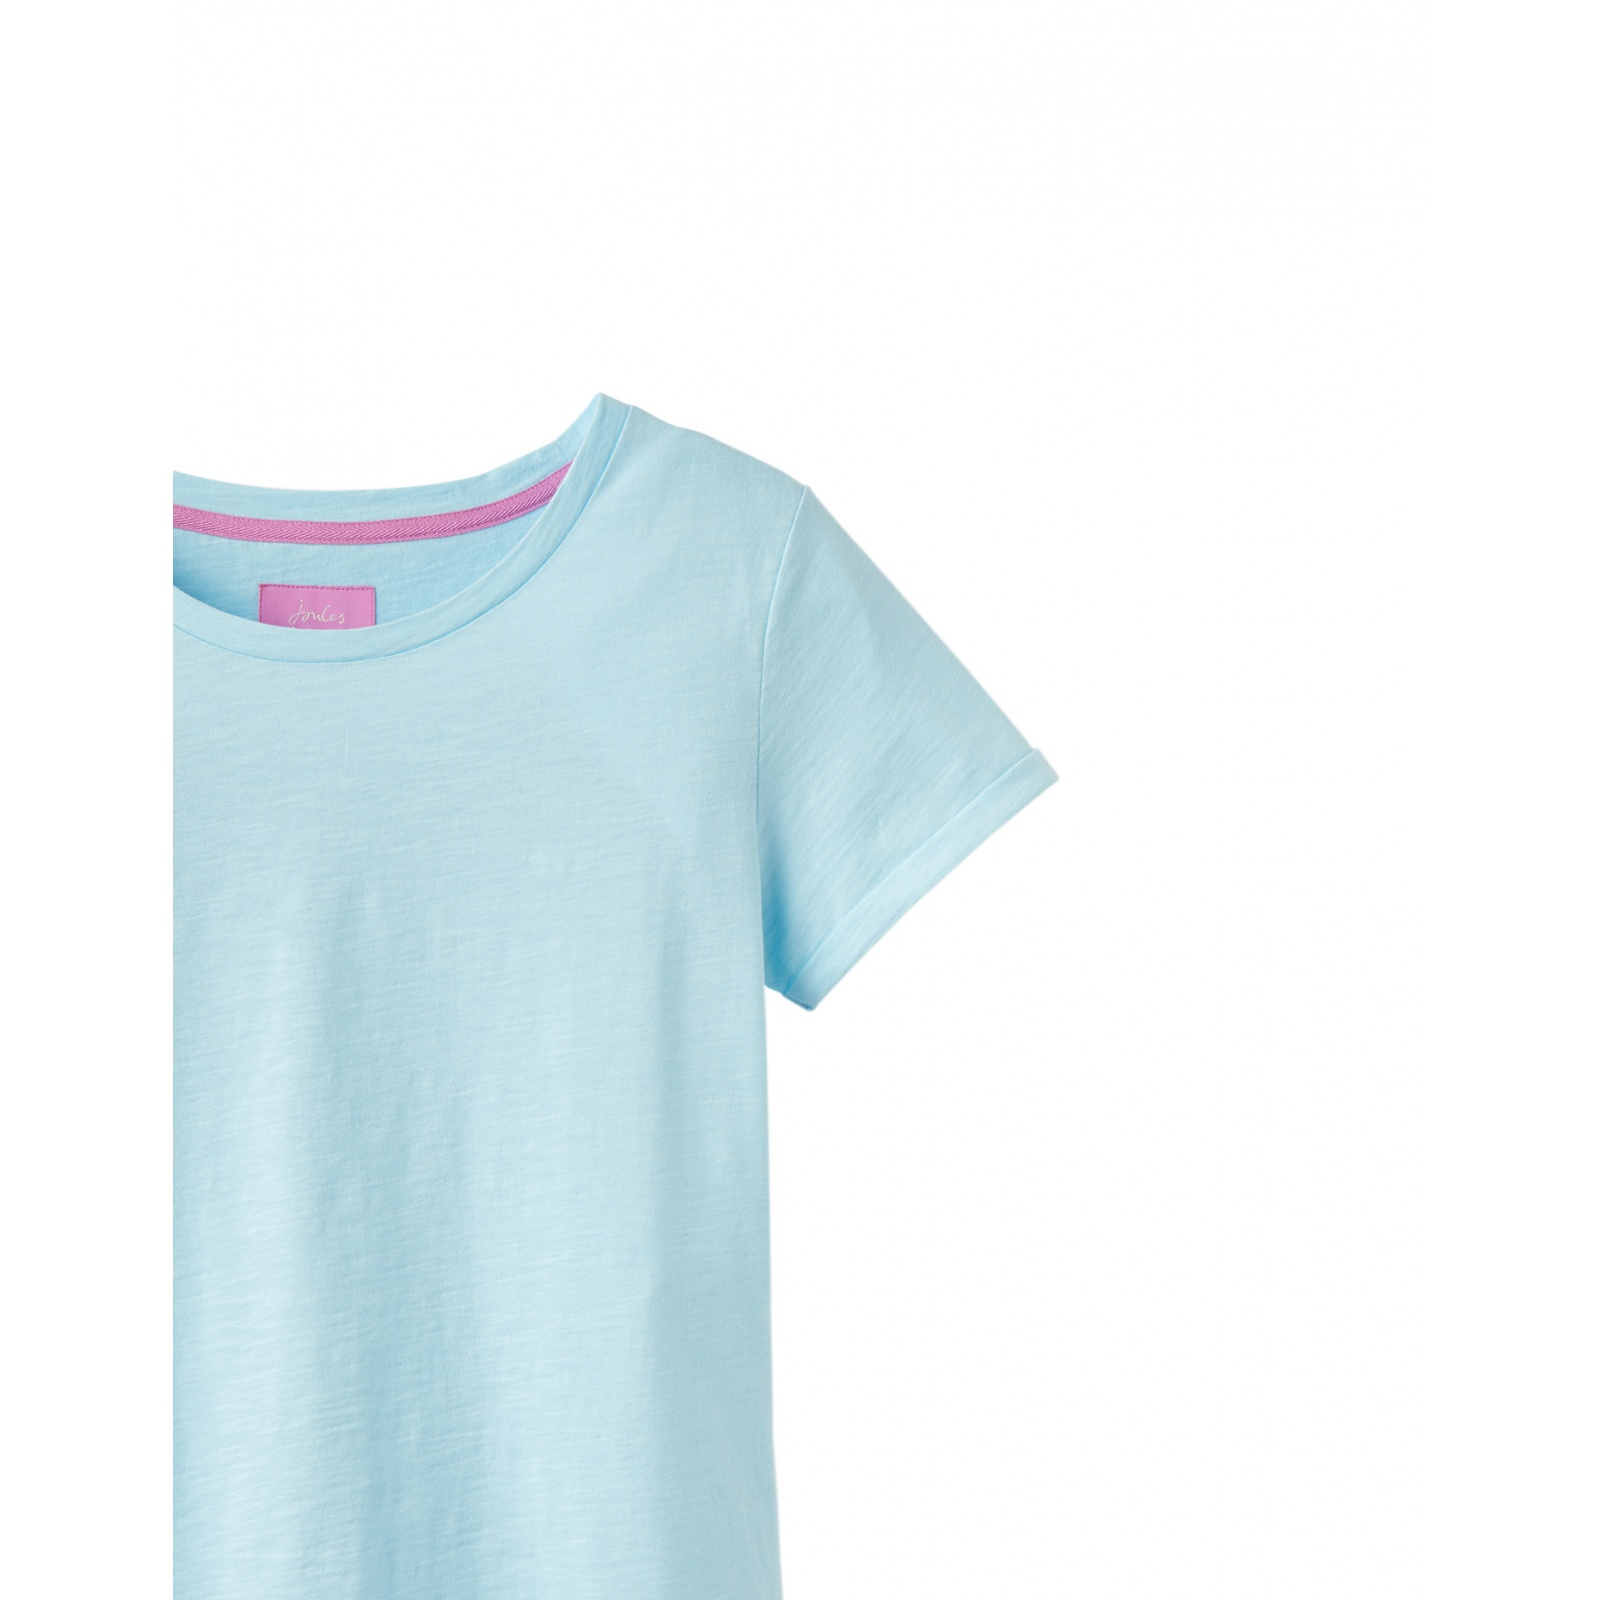 Joules-Nessa-ligero-Jersey-Camiseta-SS19 miniatura 7